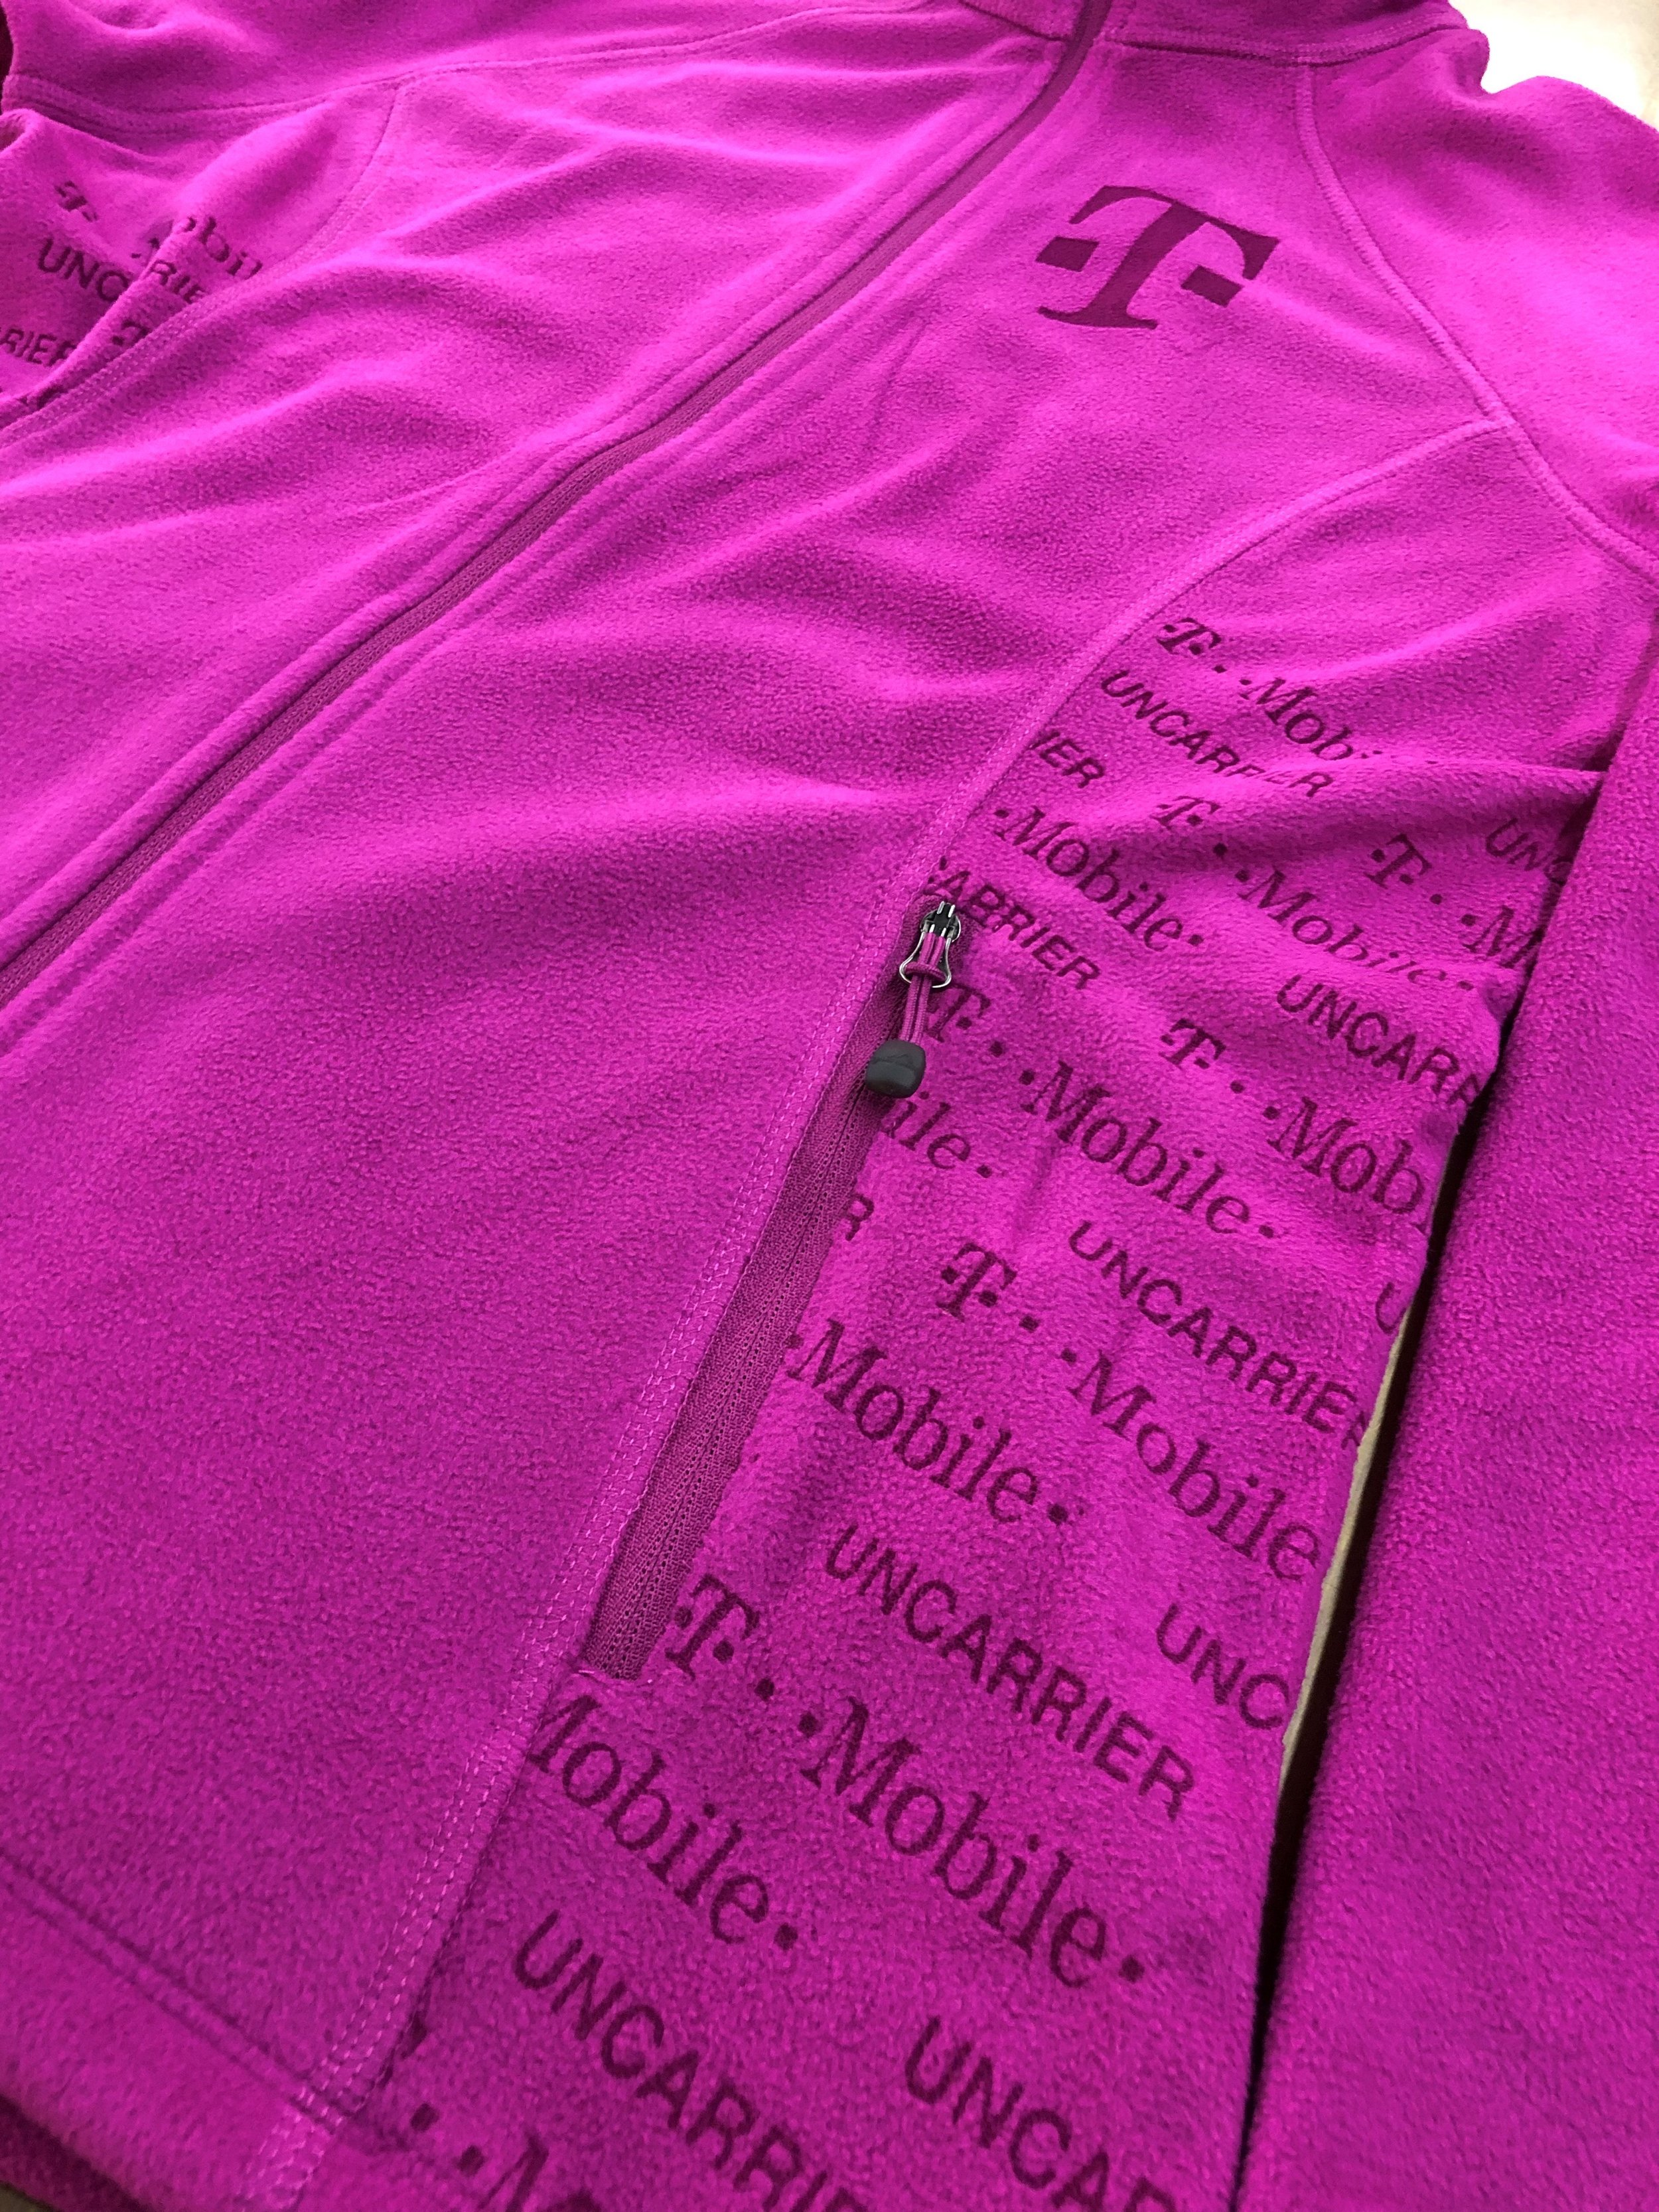 logounltd_laser_embroidery_screen_printing_apparel_uniform_custom_tshirts_kirkland_bellevue_seattle_redmond_branded_merchandise_promotional_products_logo_unltd_t_mobile_Tuesday_tmobile_un_carrier_magenta_5G_john_lege (16).jpg